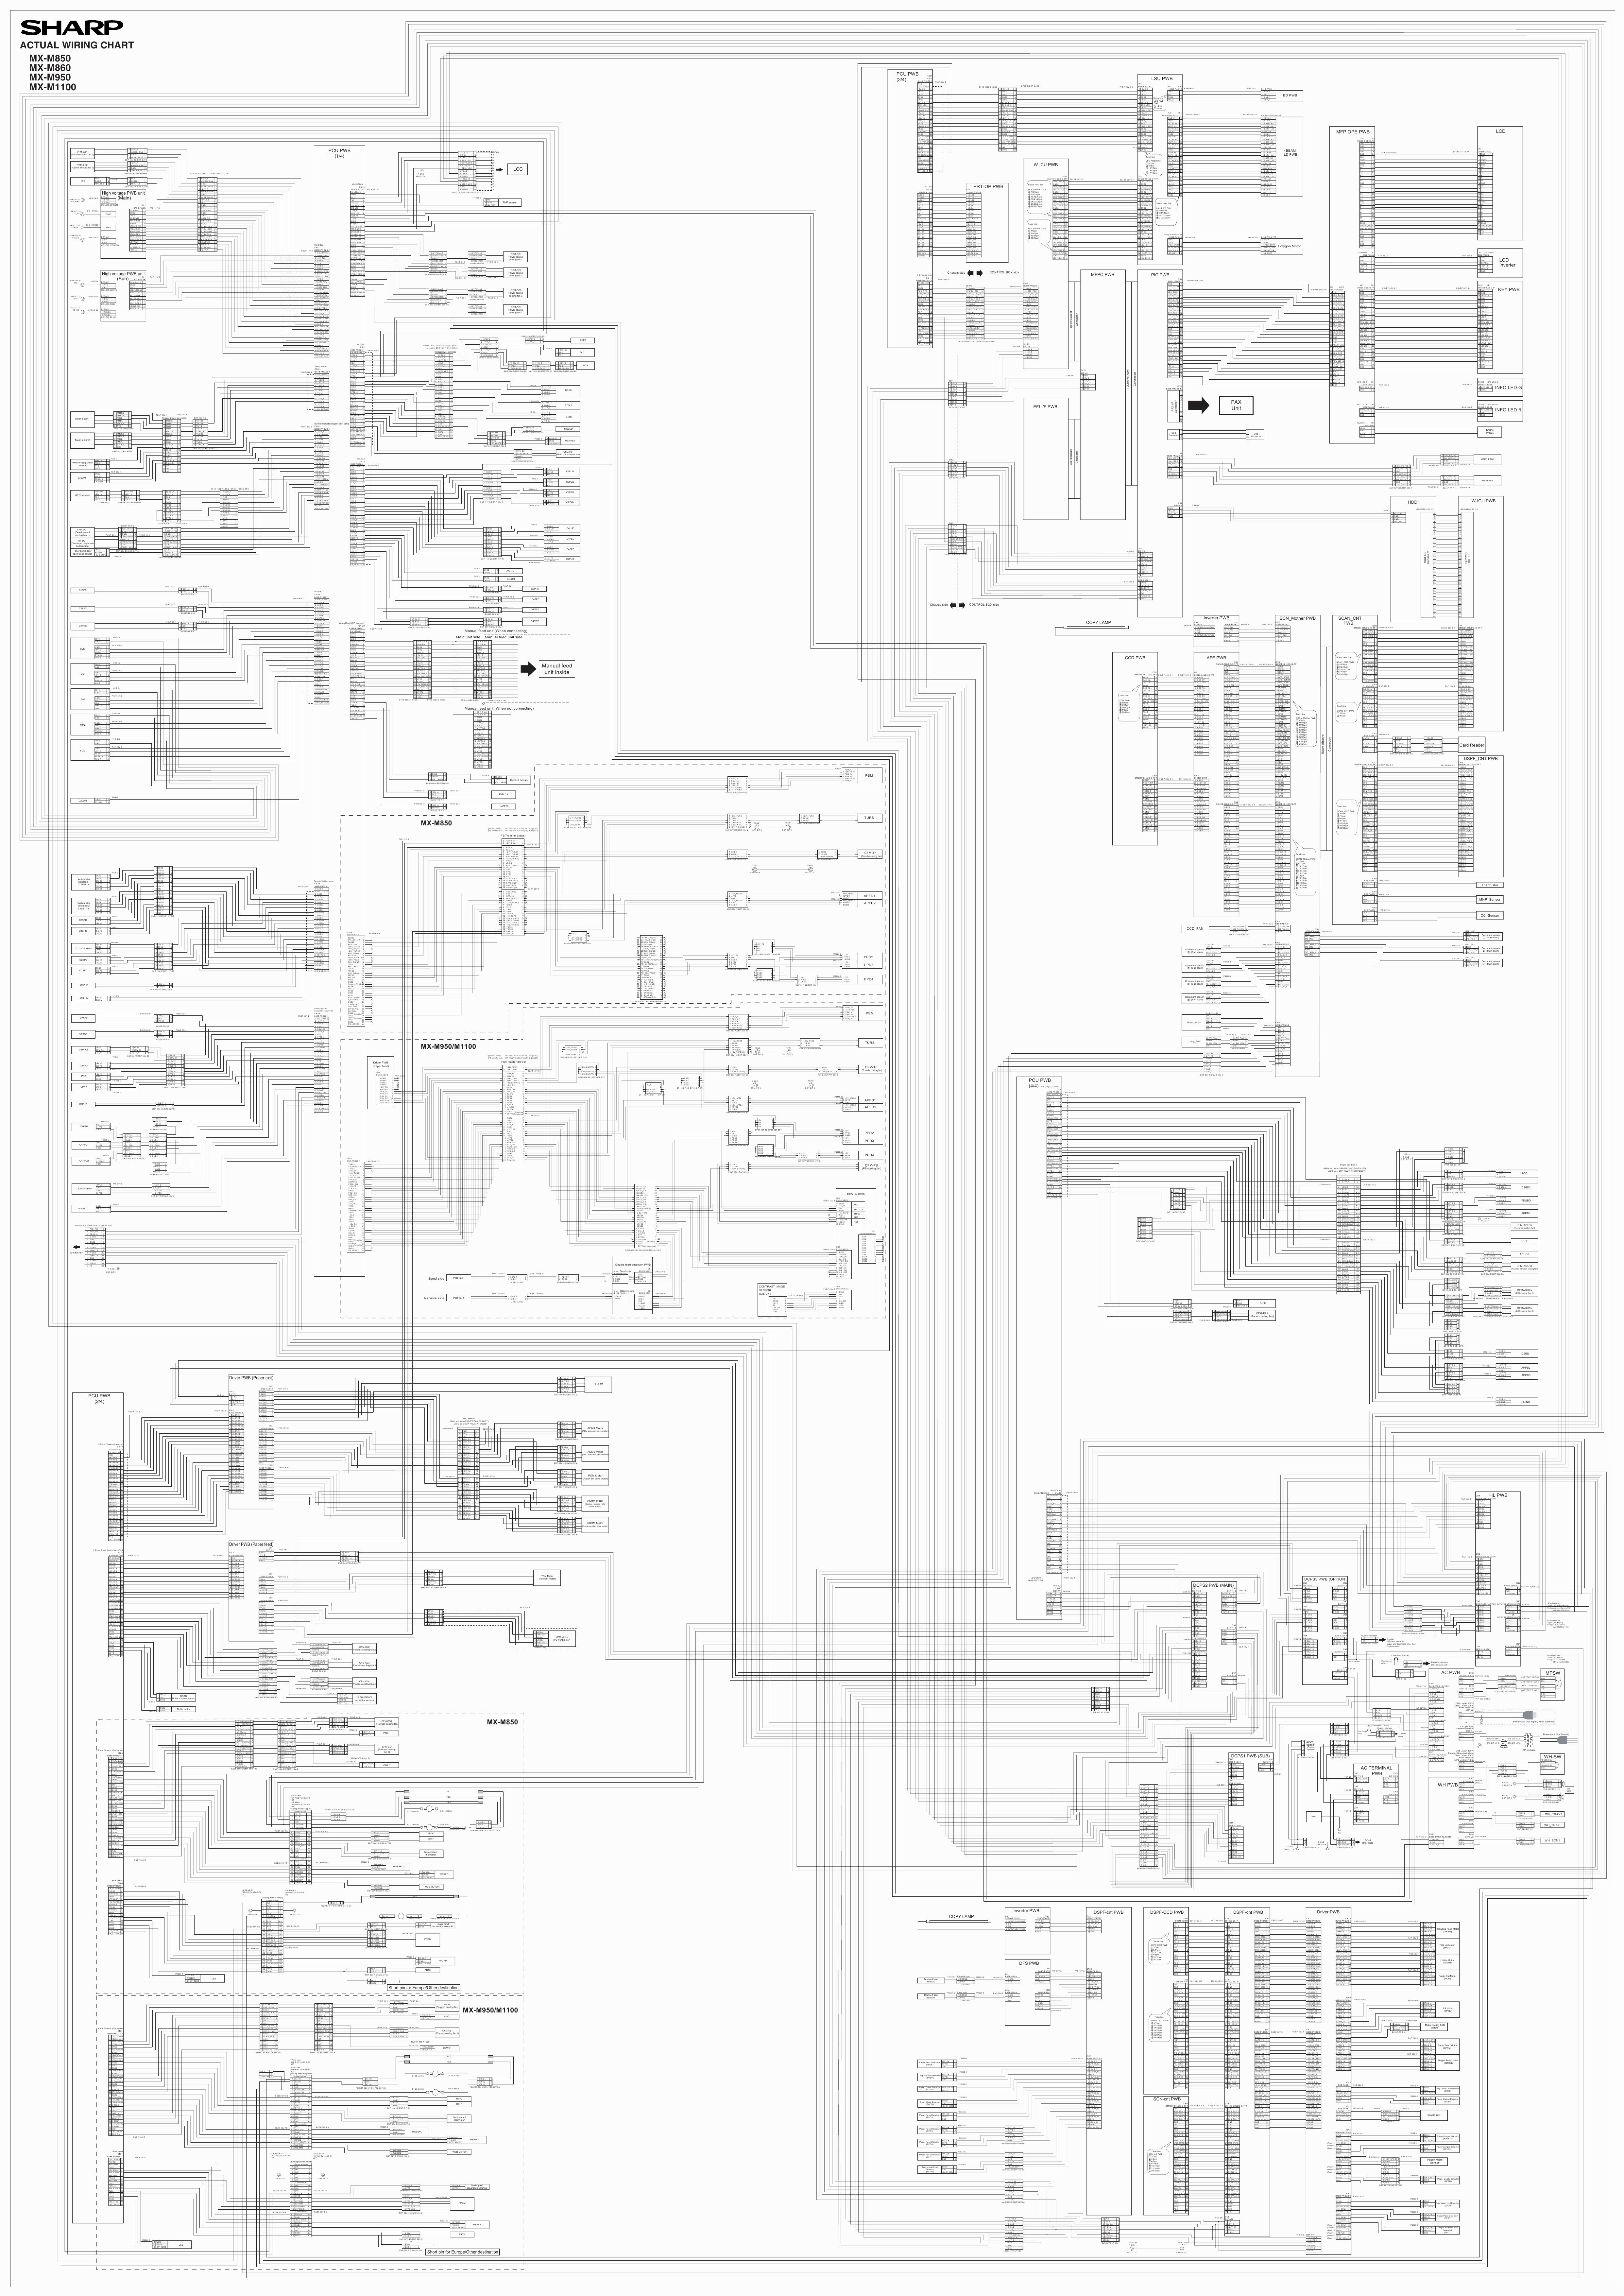 sharp mx m850 m860 m950 m1100 wiring chart diagrams